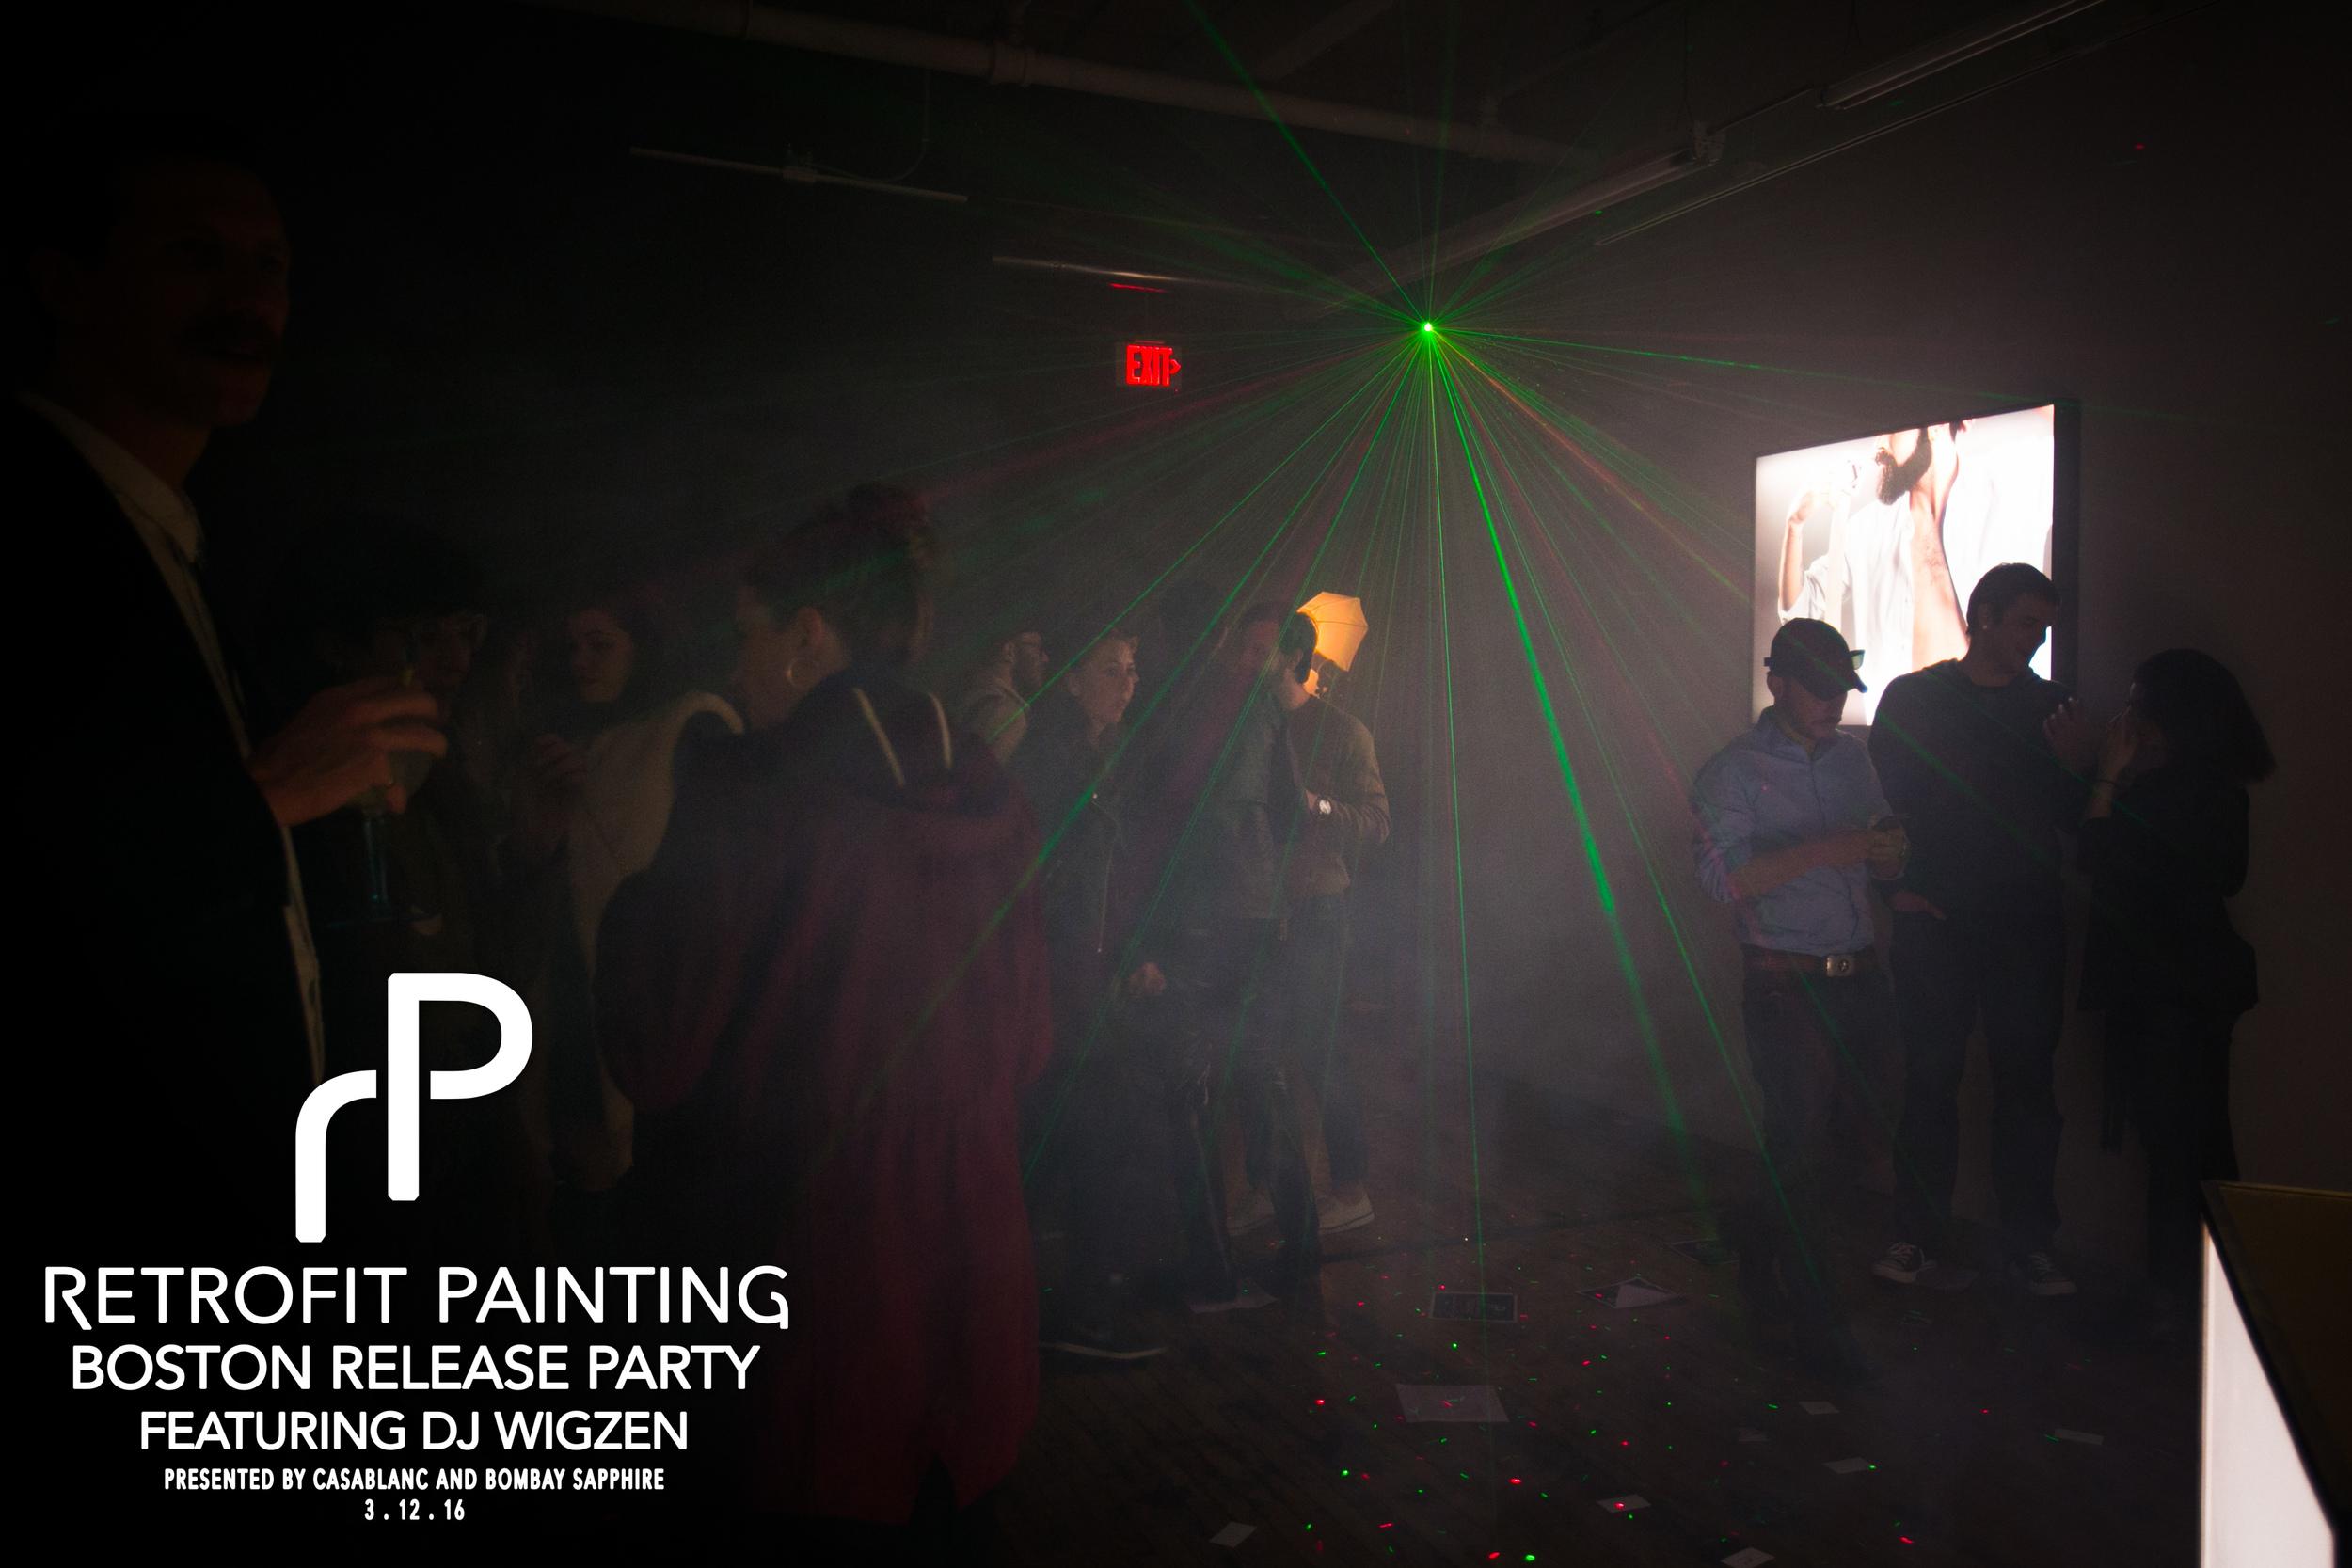 Retrofit Painting Boston Release Party 0163.jpg